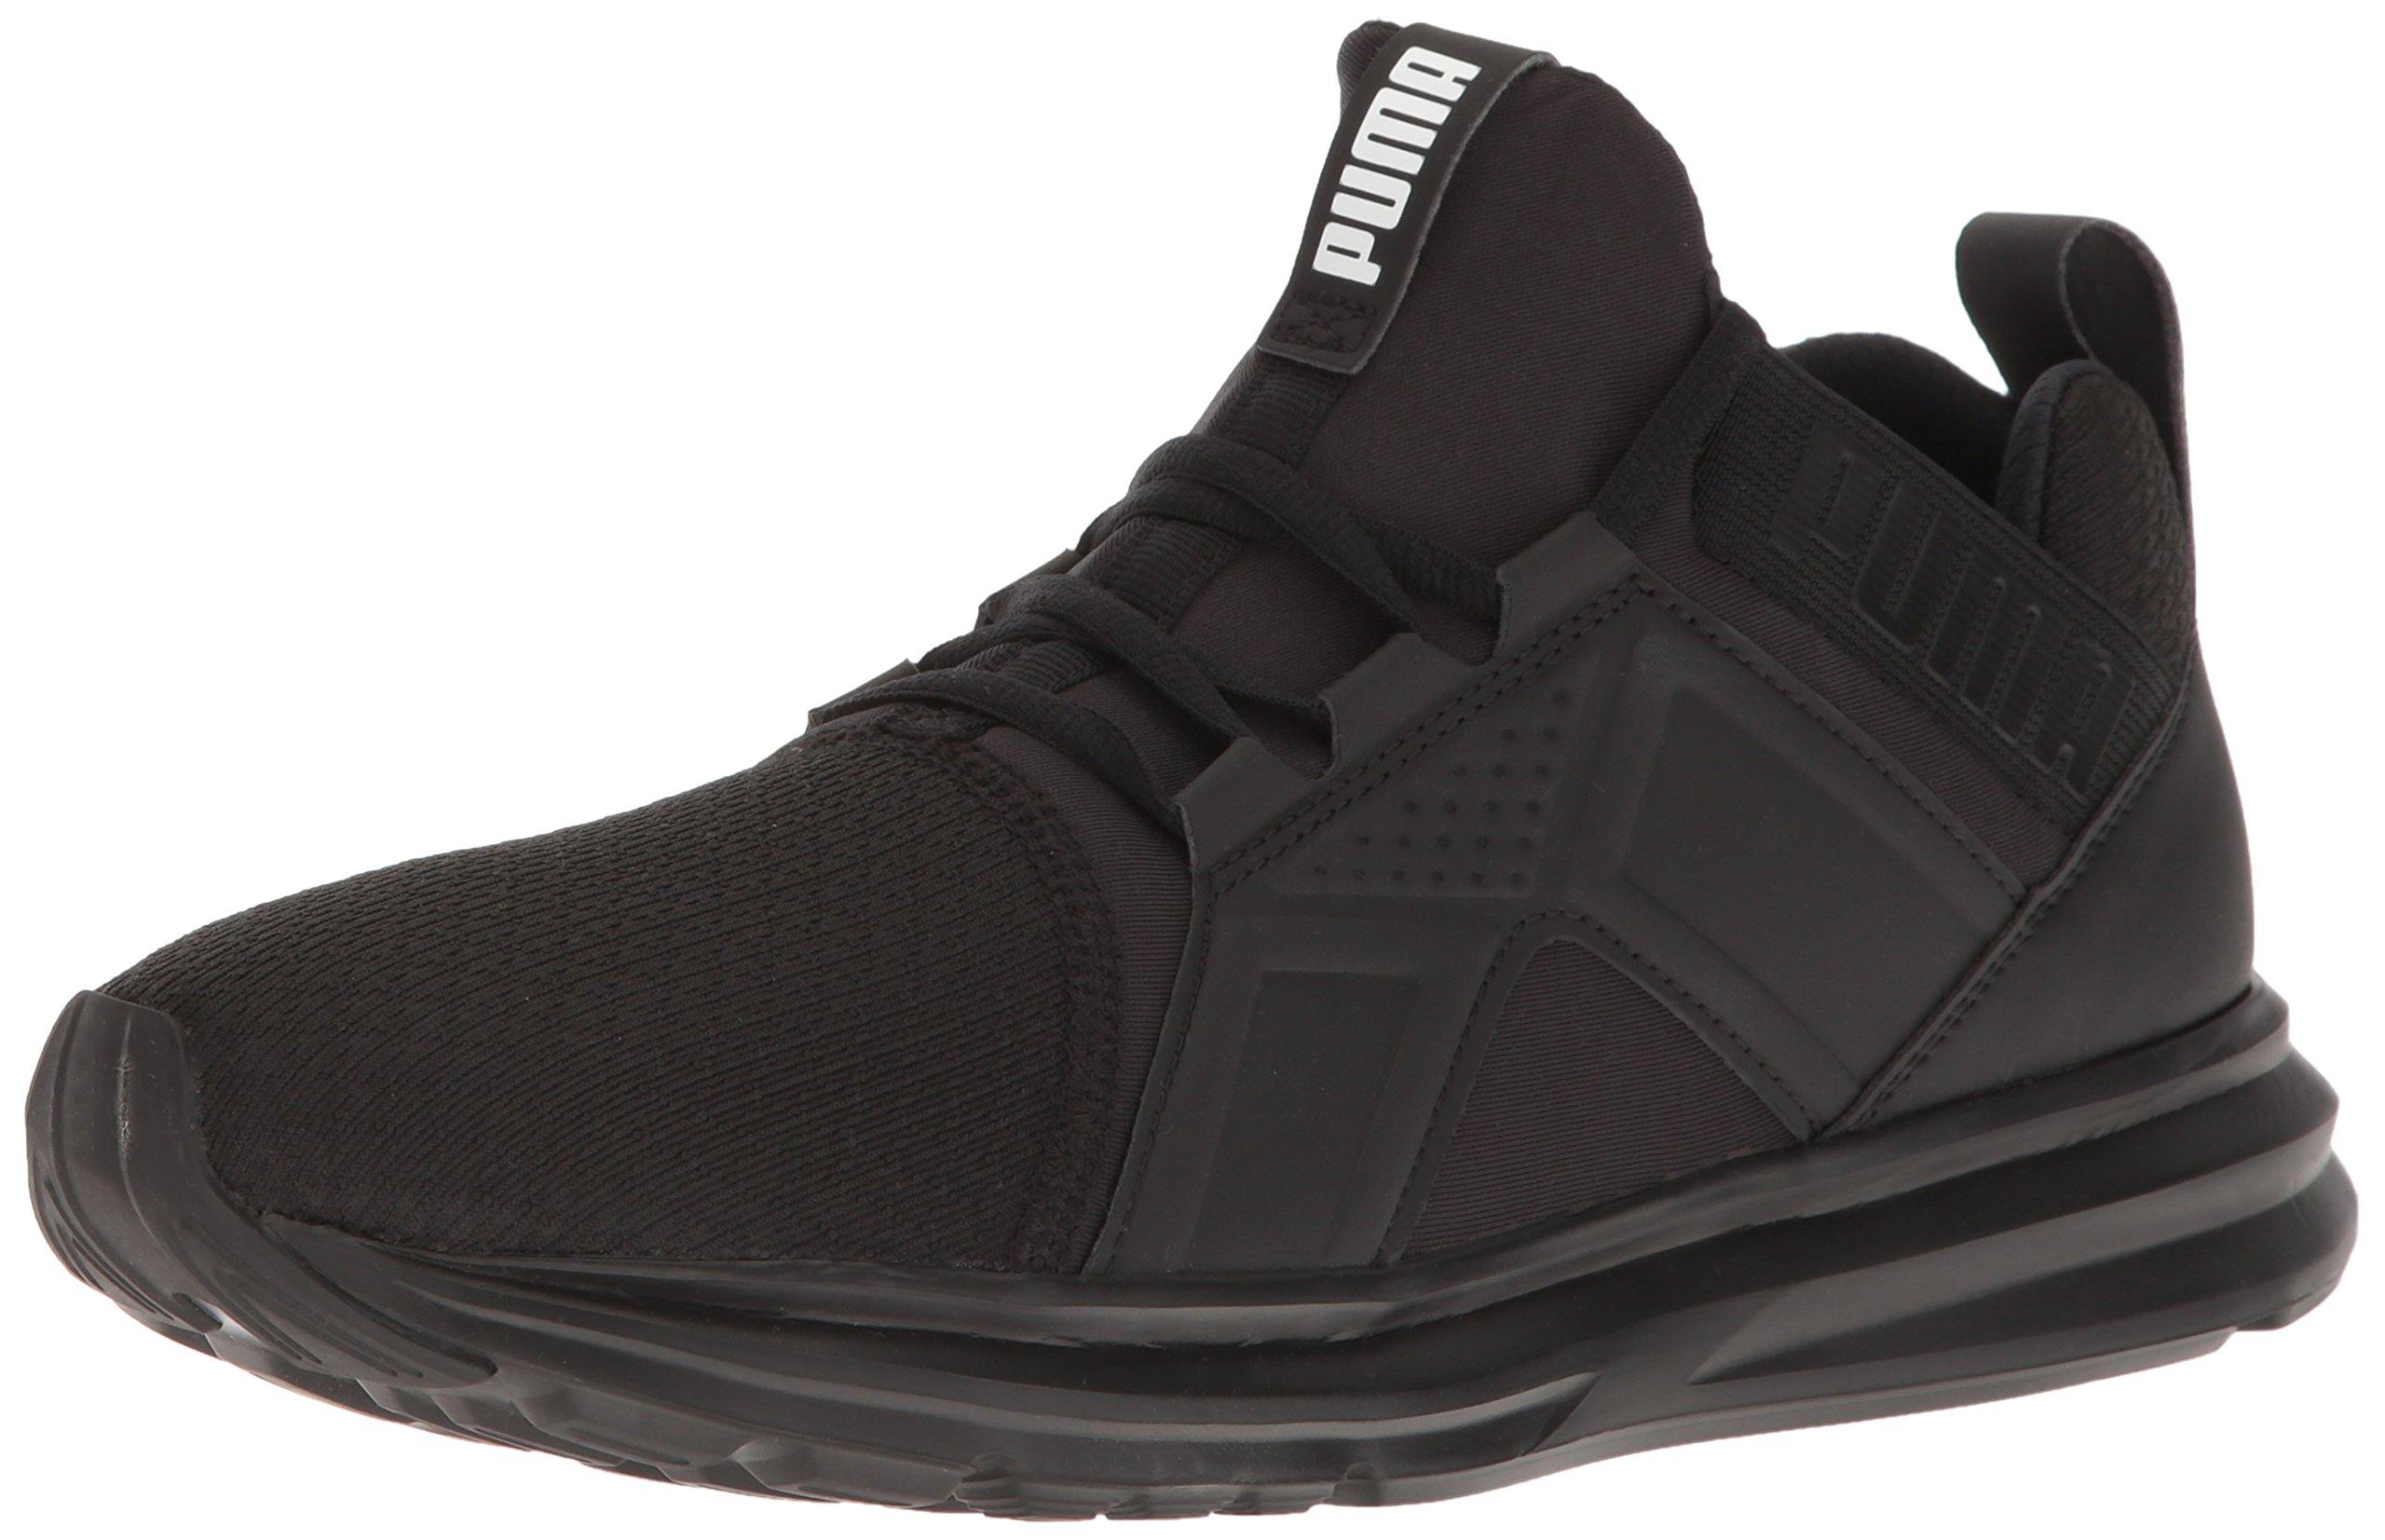 PUMA Men's ENZO Sneaker, Black, 9.5 M US